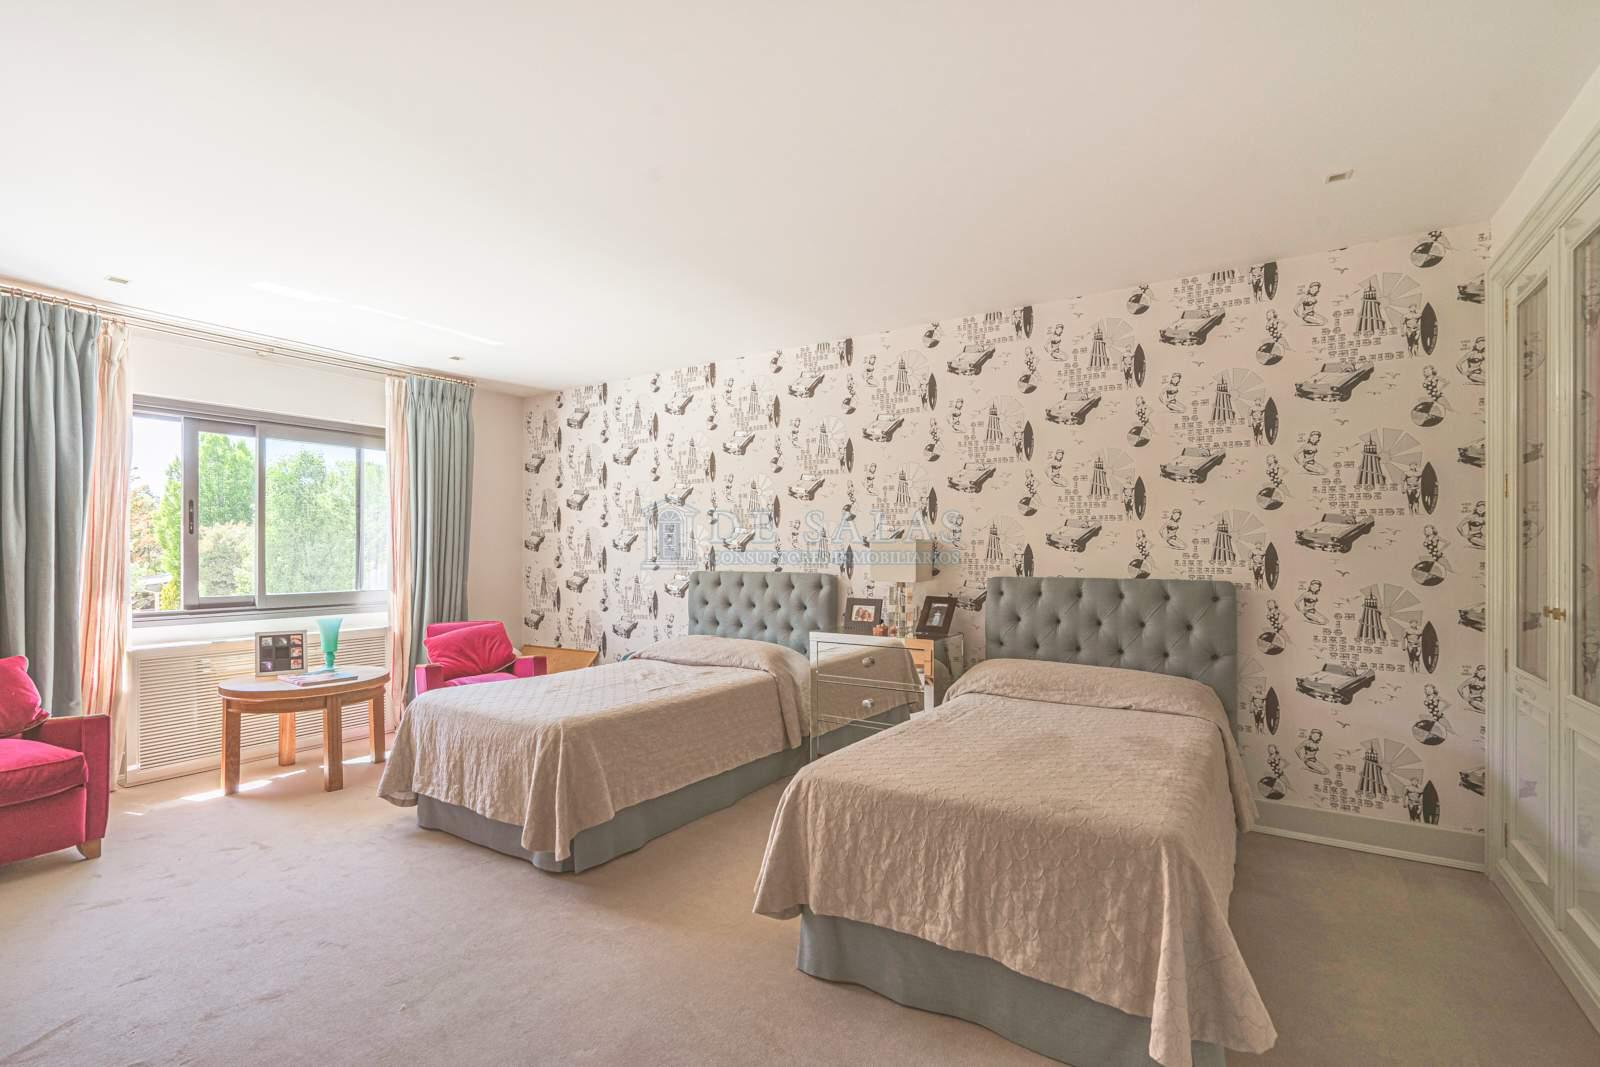 Dormitorio-0020 Chalet La Moraleja